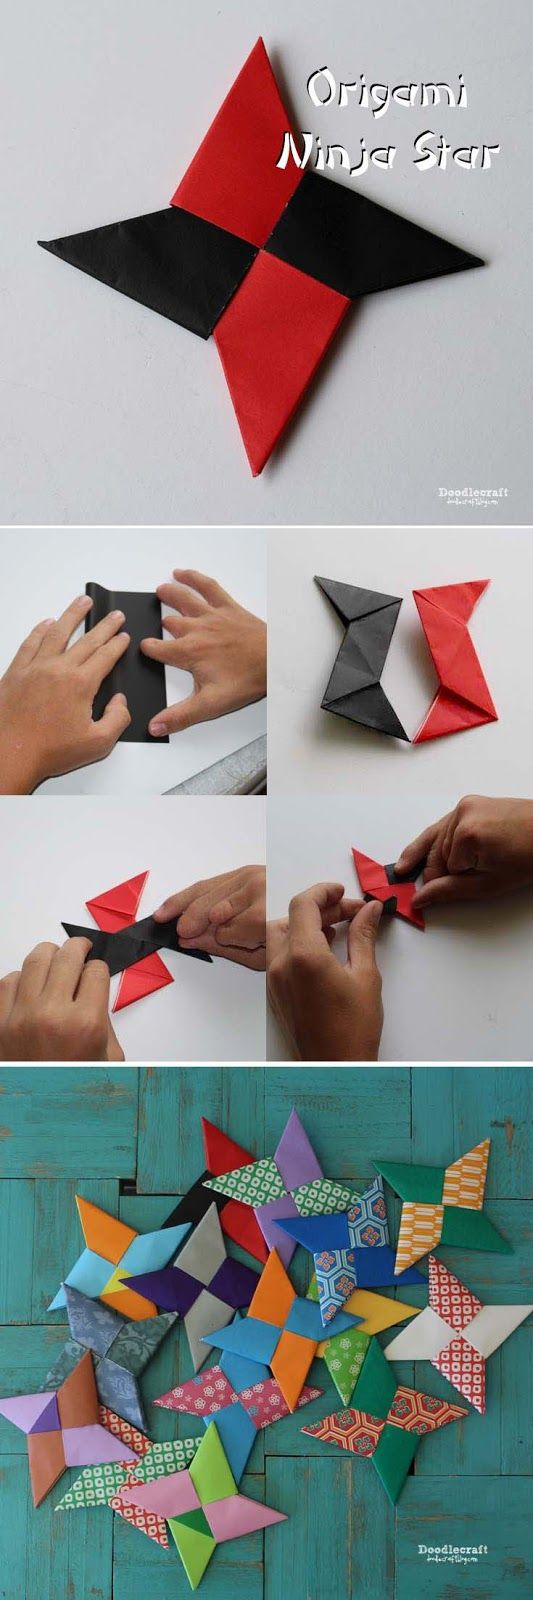 Doodlecraft: Origami Ninja Stars!